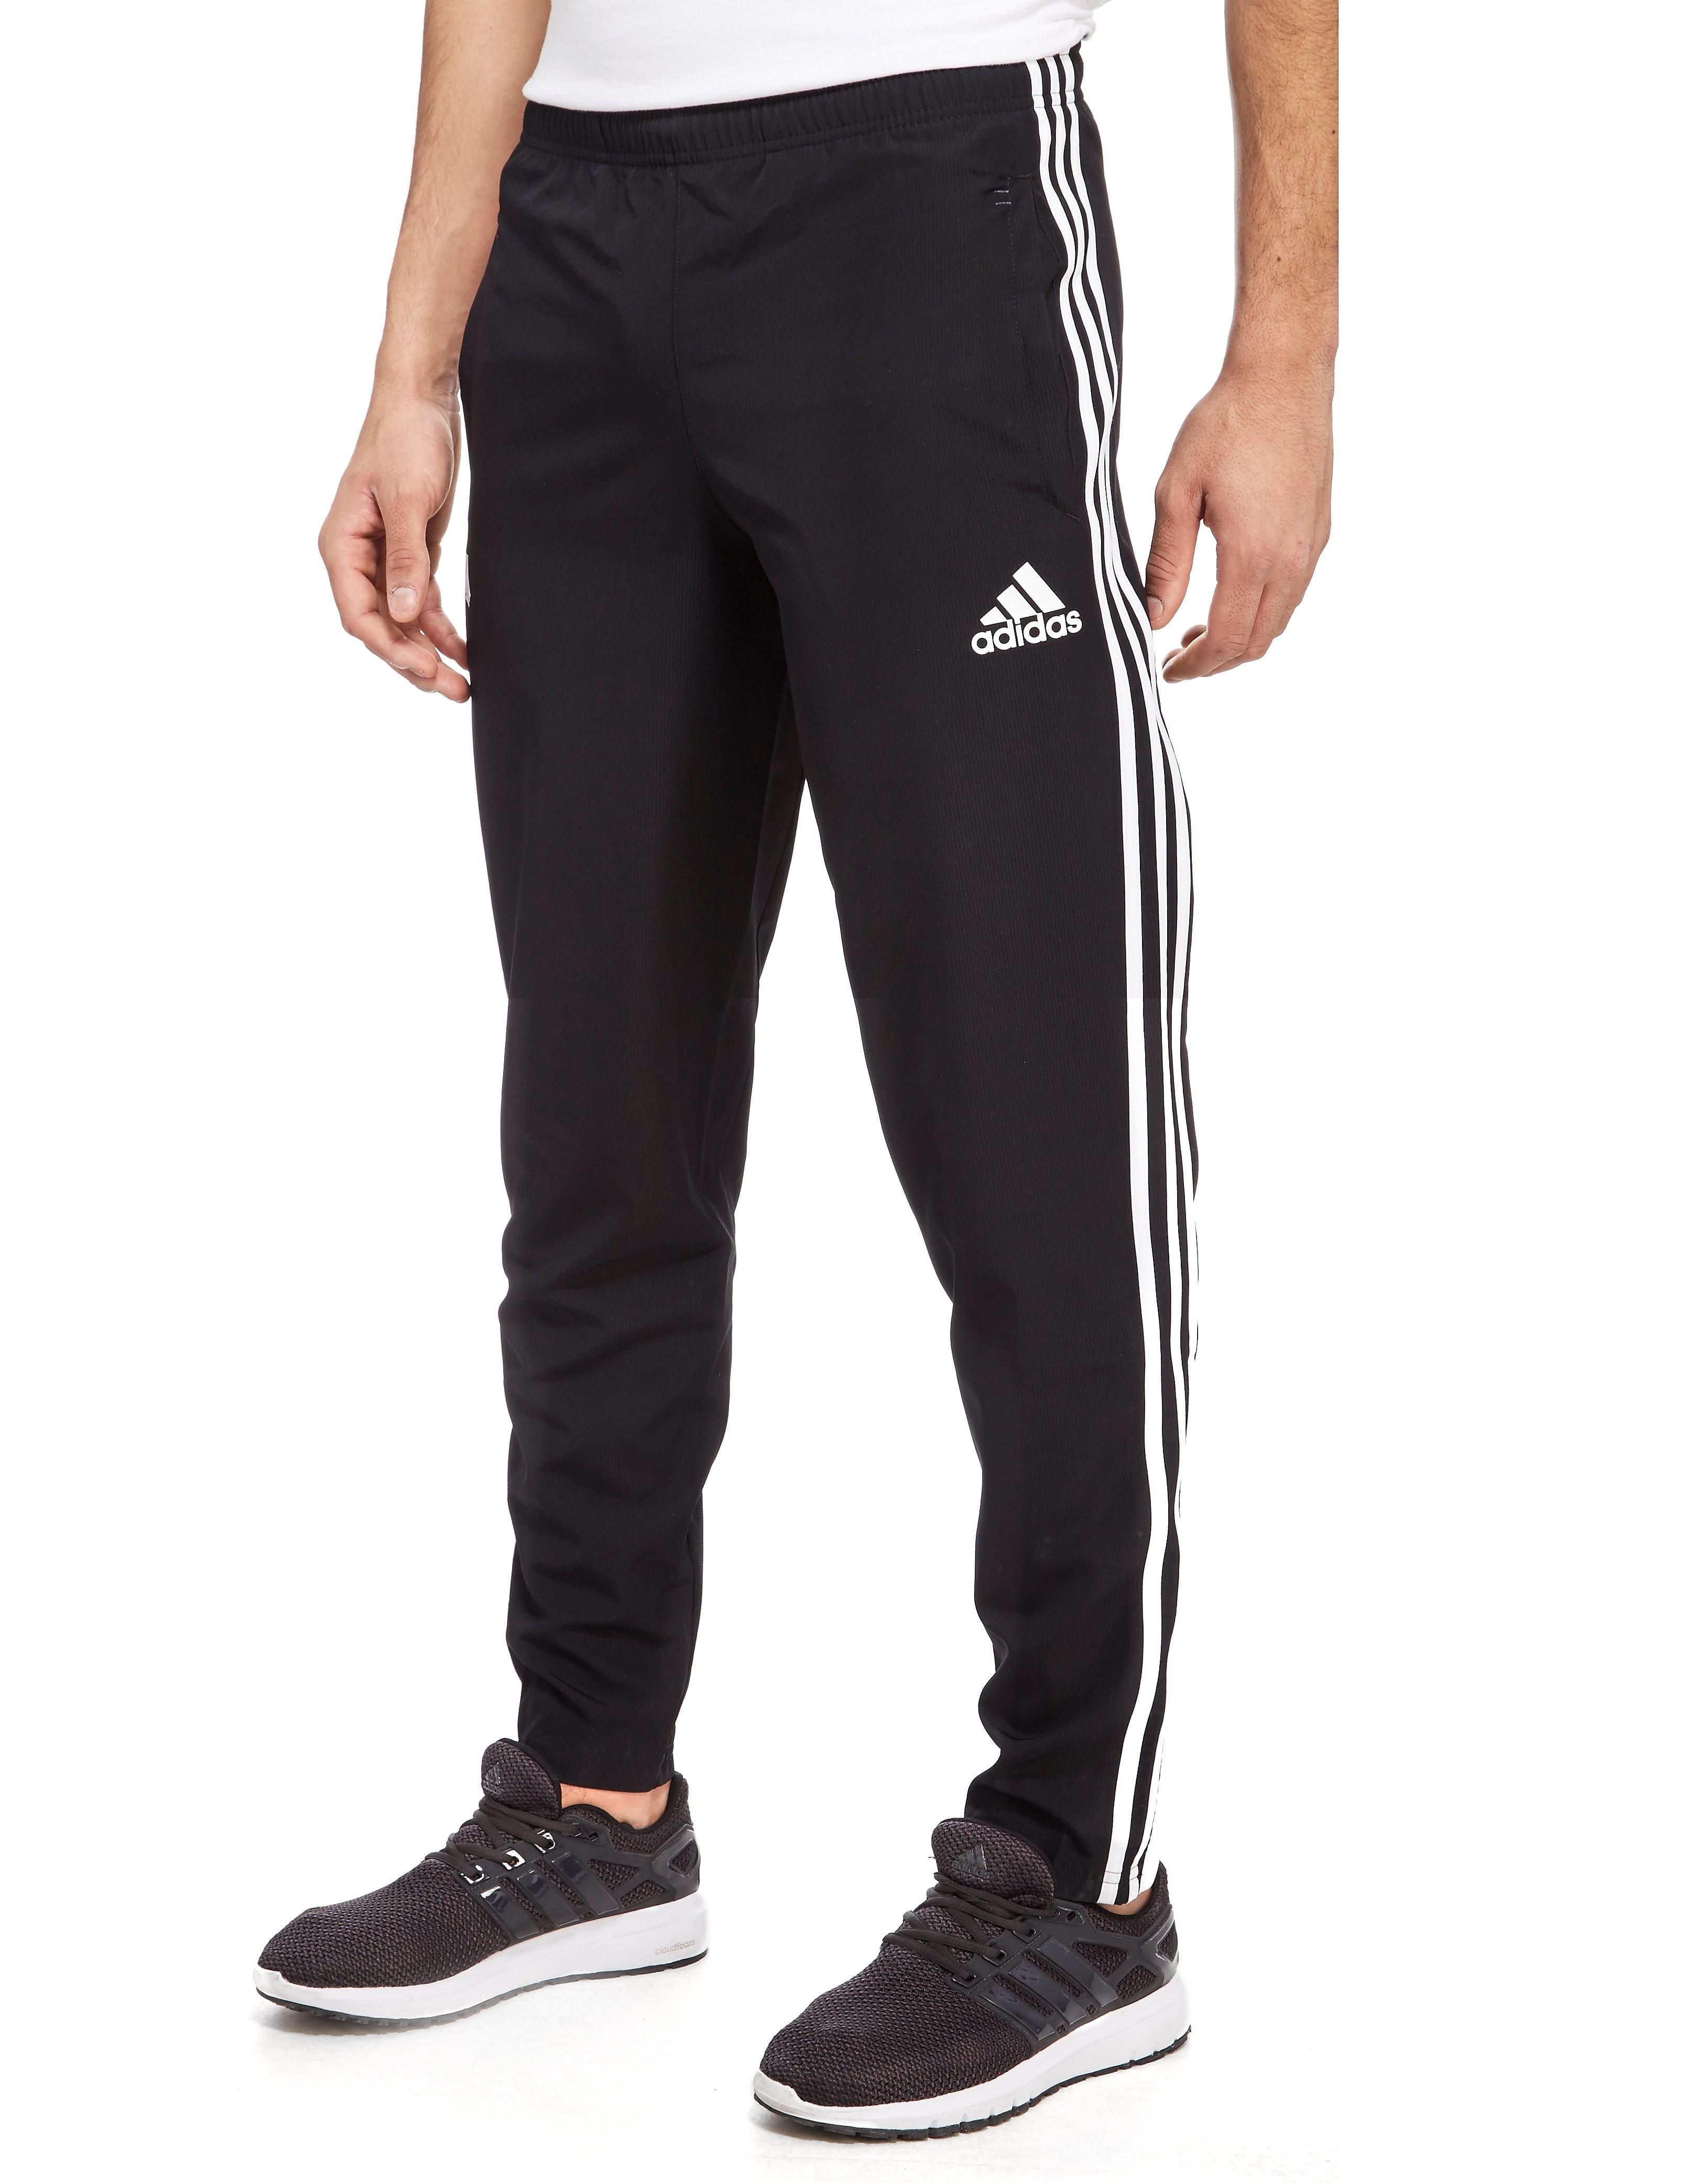 adidas Tango Woven Pants